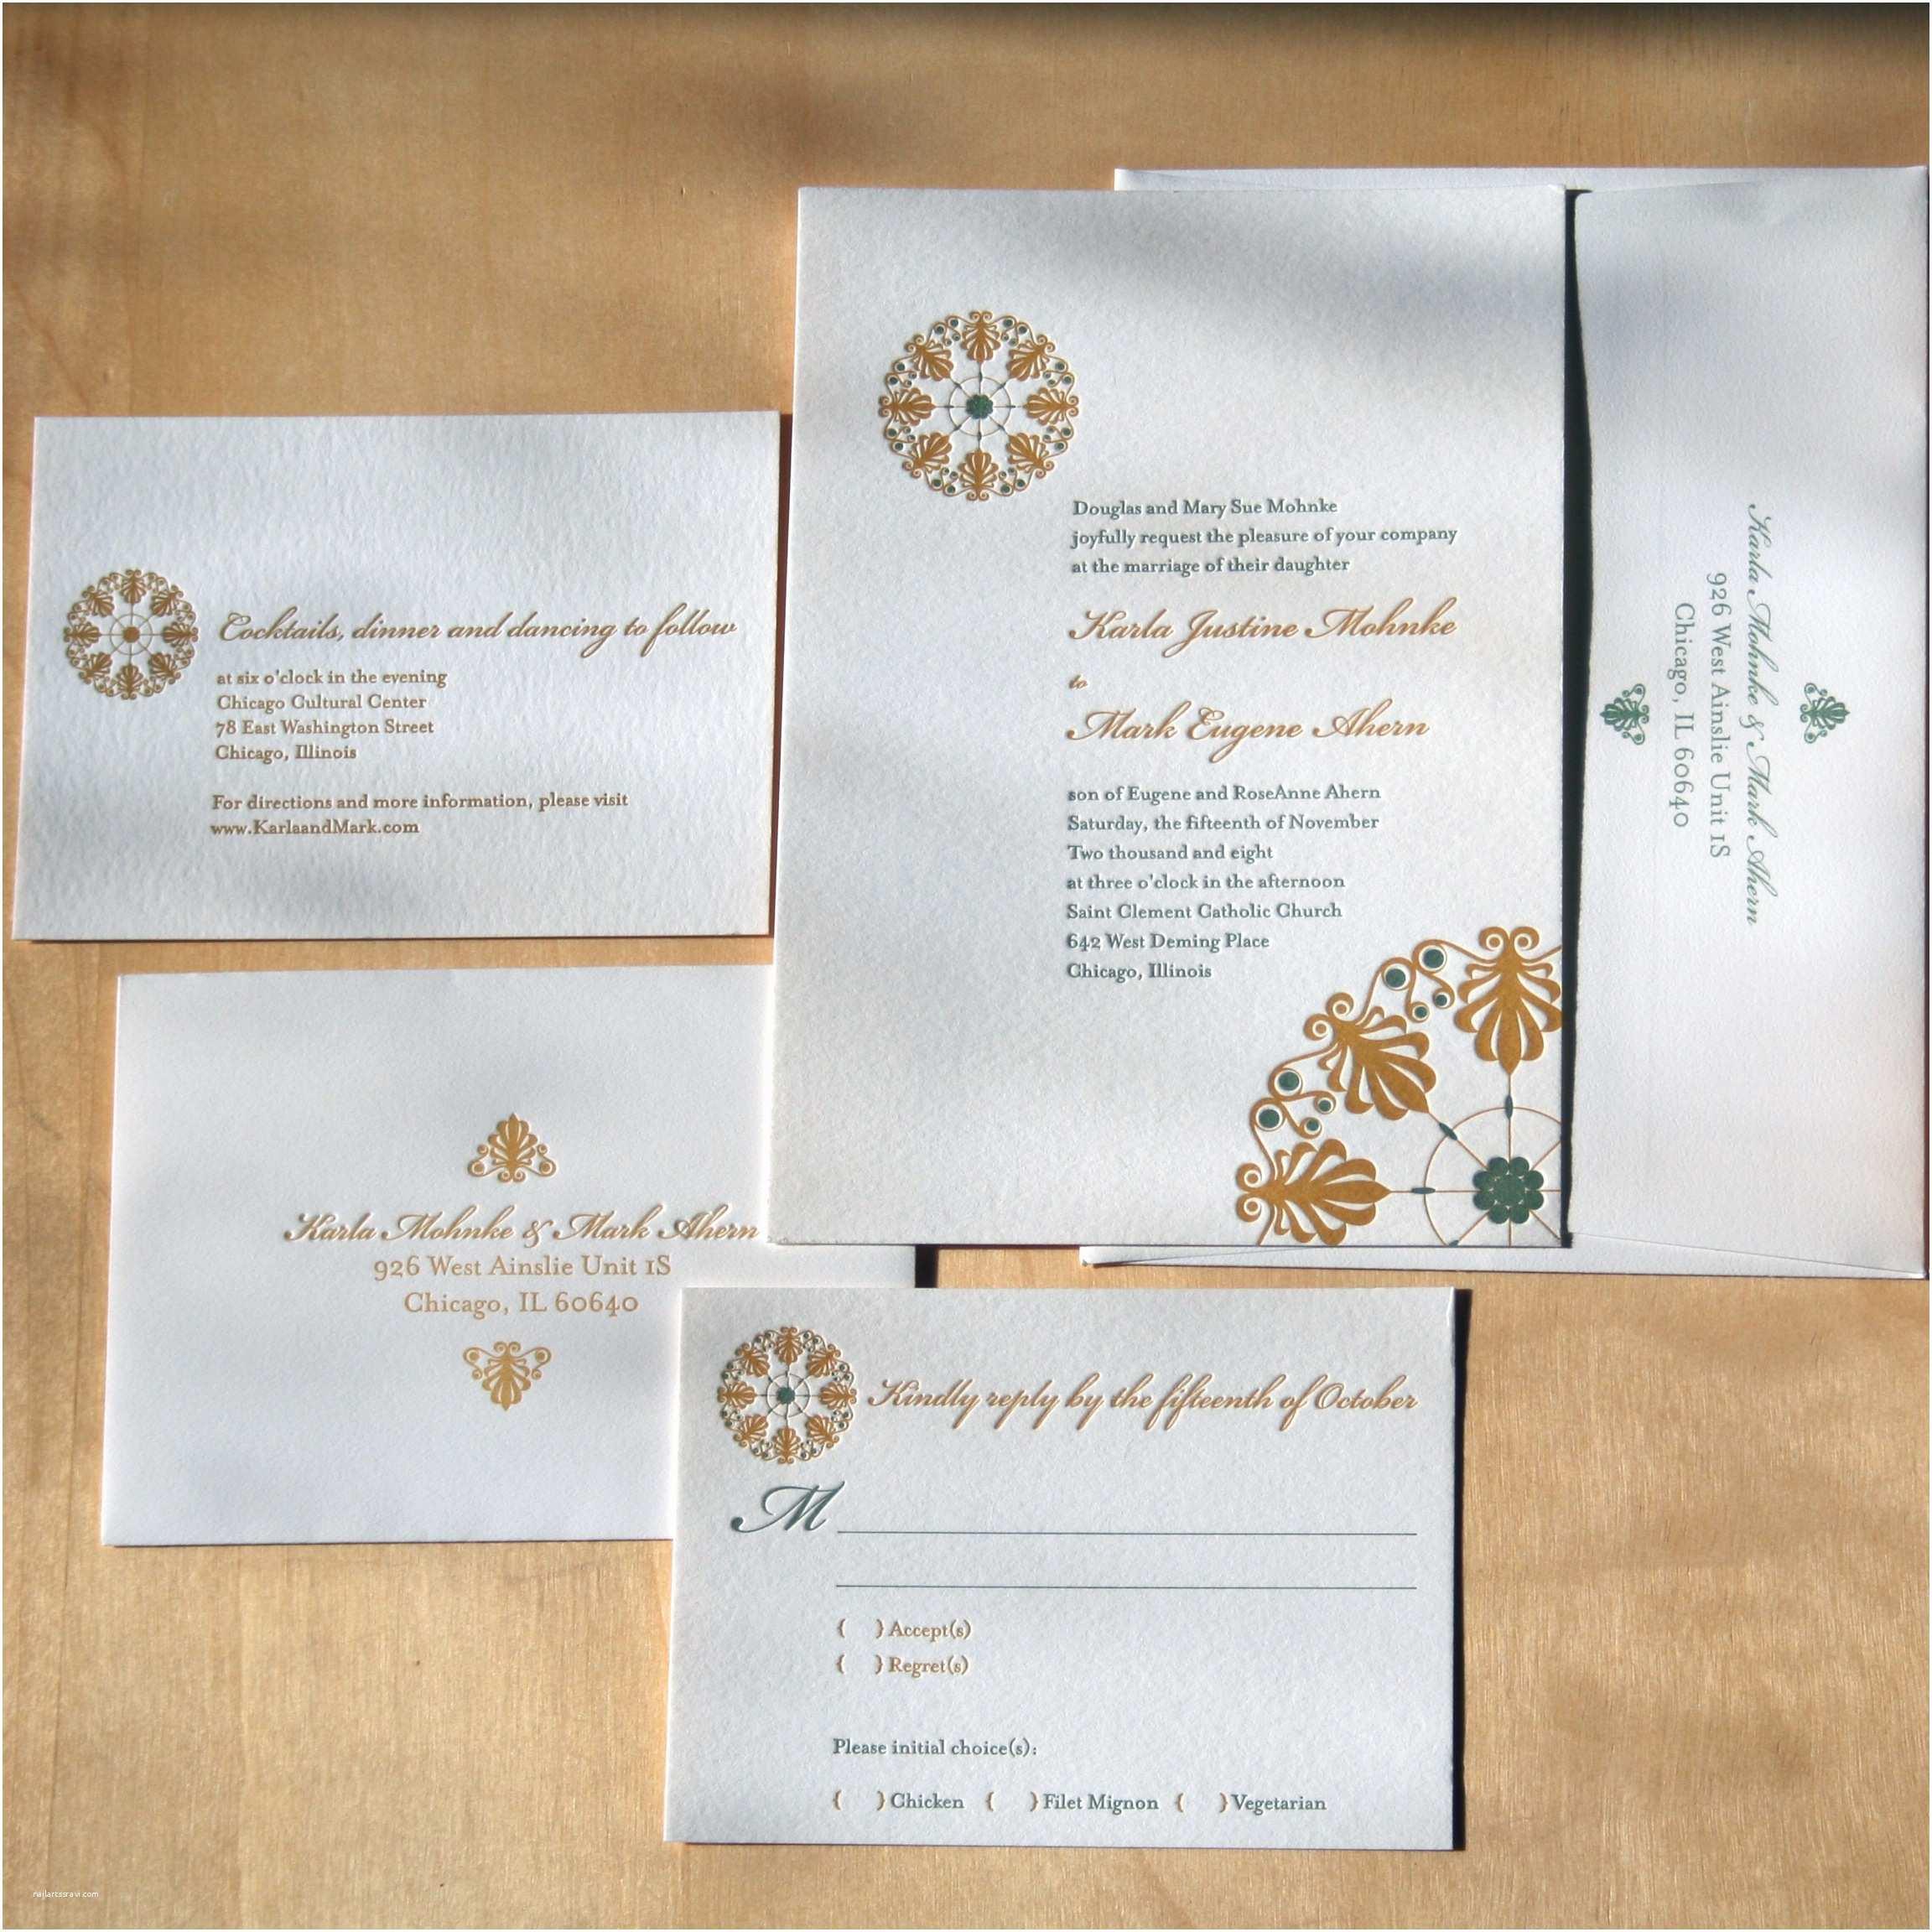 Affordable Wedding Invitations Invitation Kit Wedding Copy Amazing Affordable Wedding